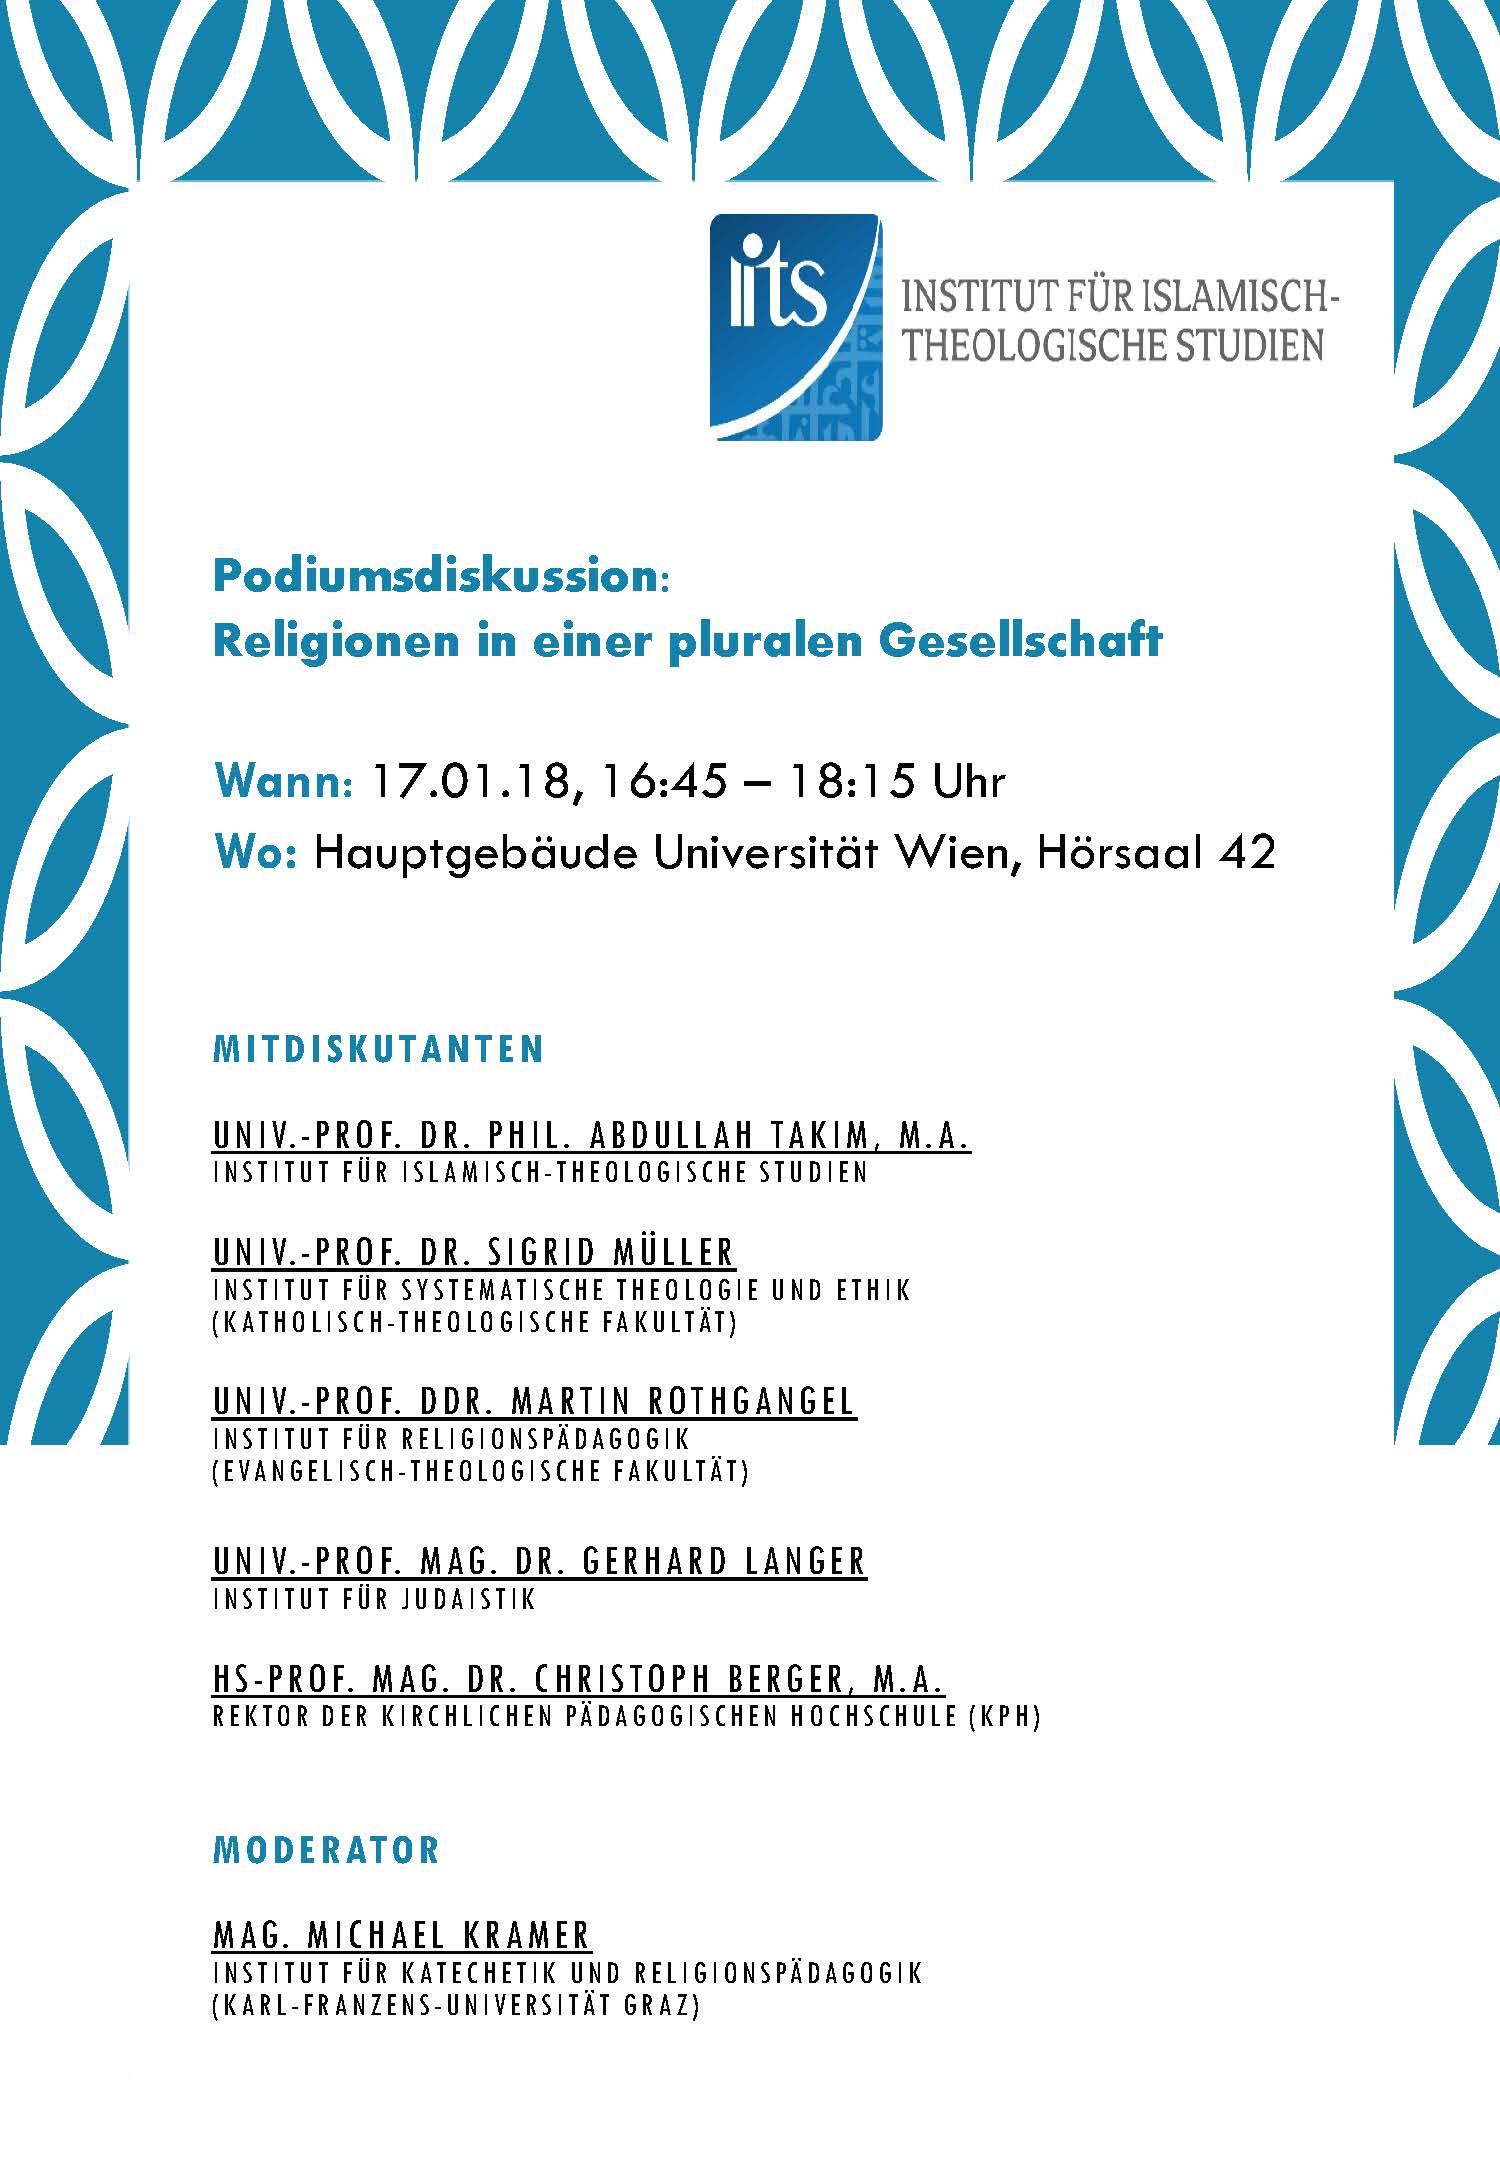 Großartig Meistgesuchte Postervorlagen Galerie - Entry Level Resume ...